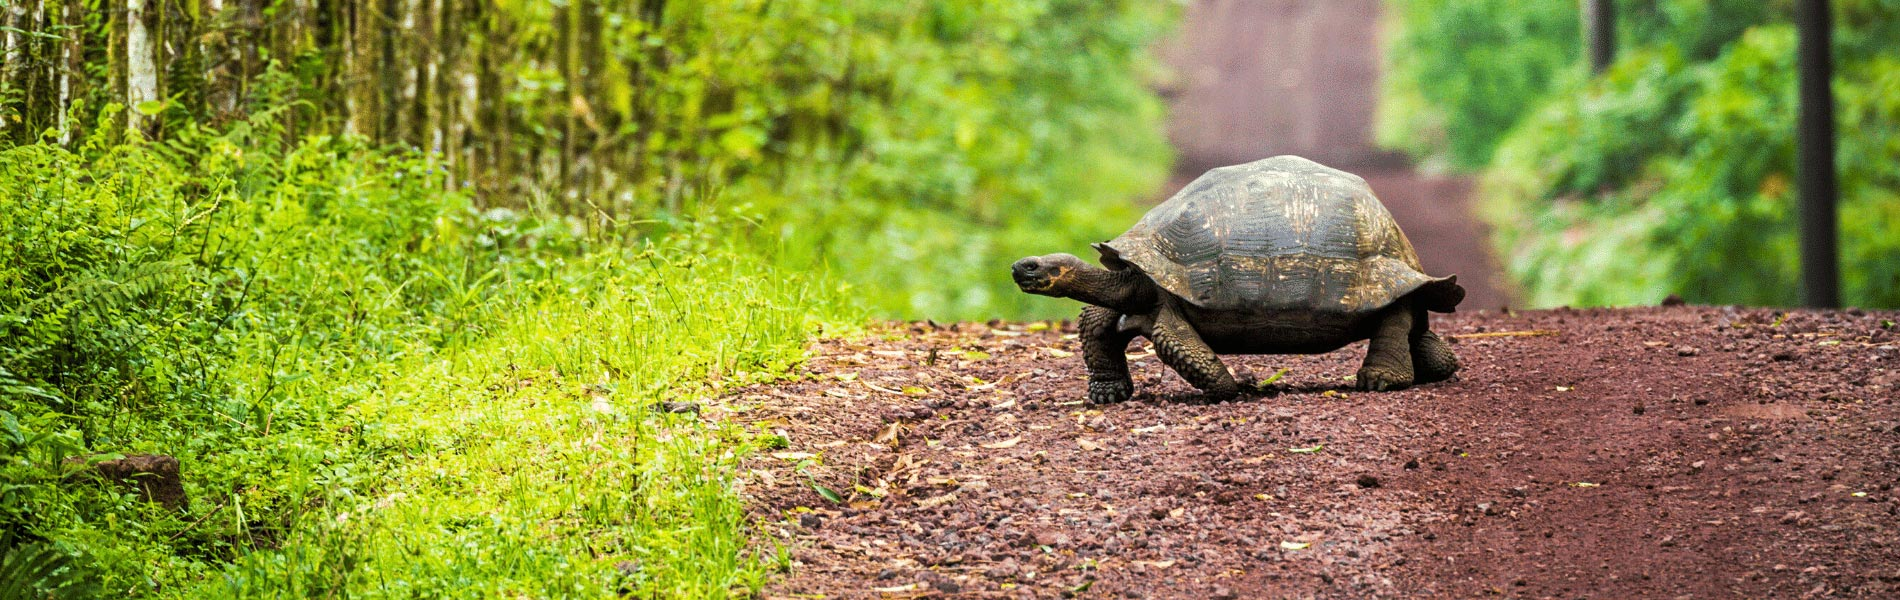 Galapagos Island Hopping West